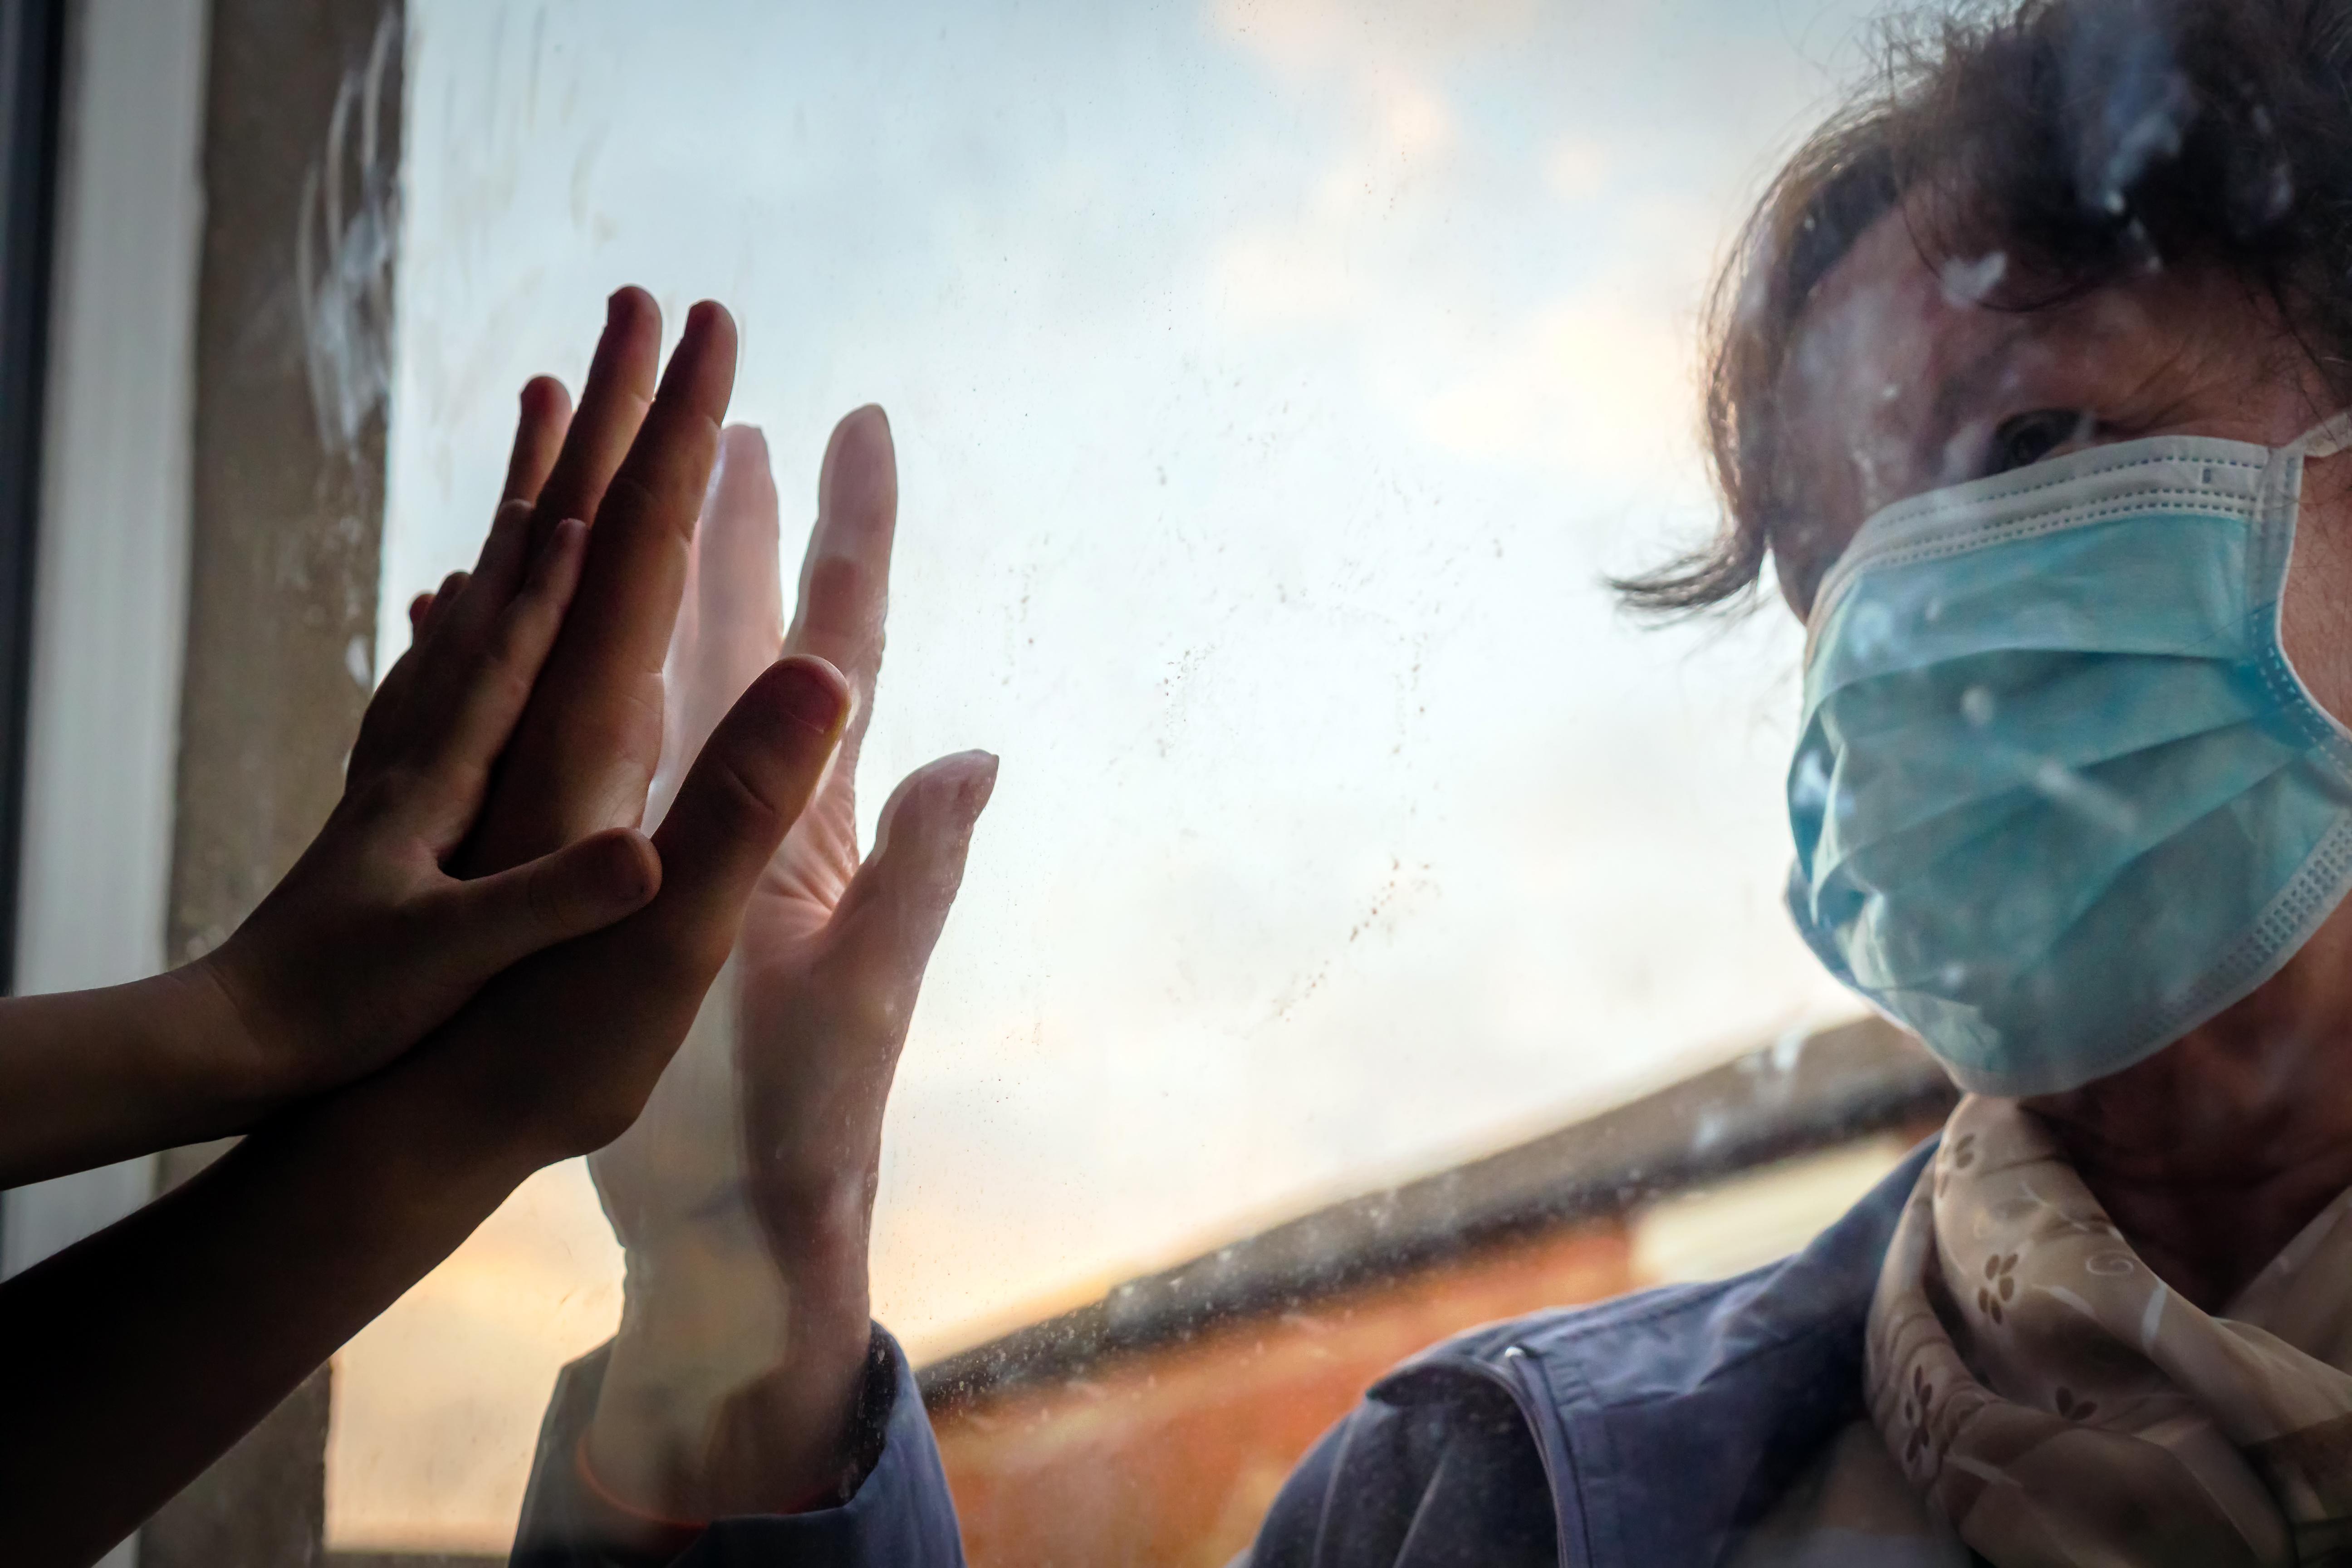 woman with mask reaching toward grandchildren's hands through a windowpane